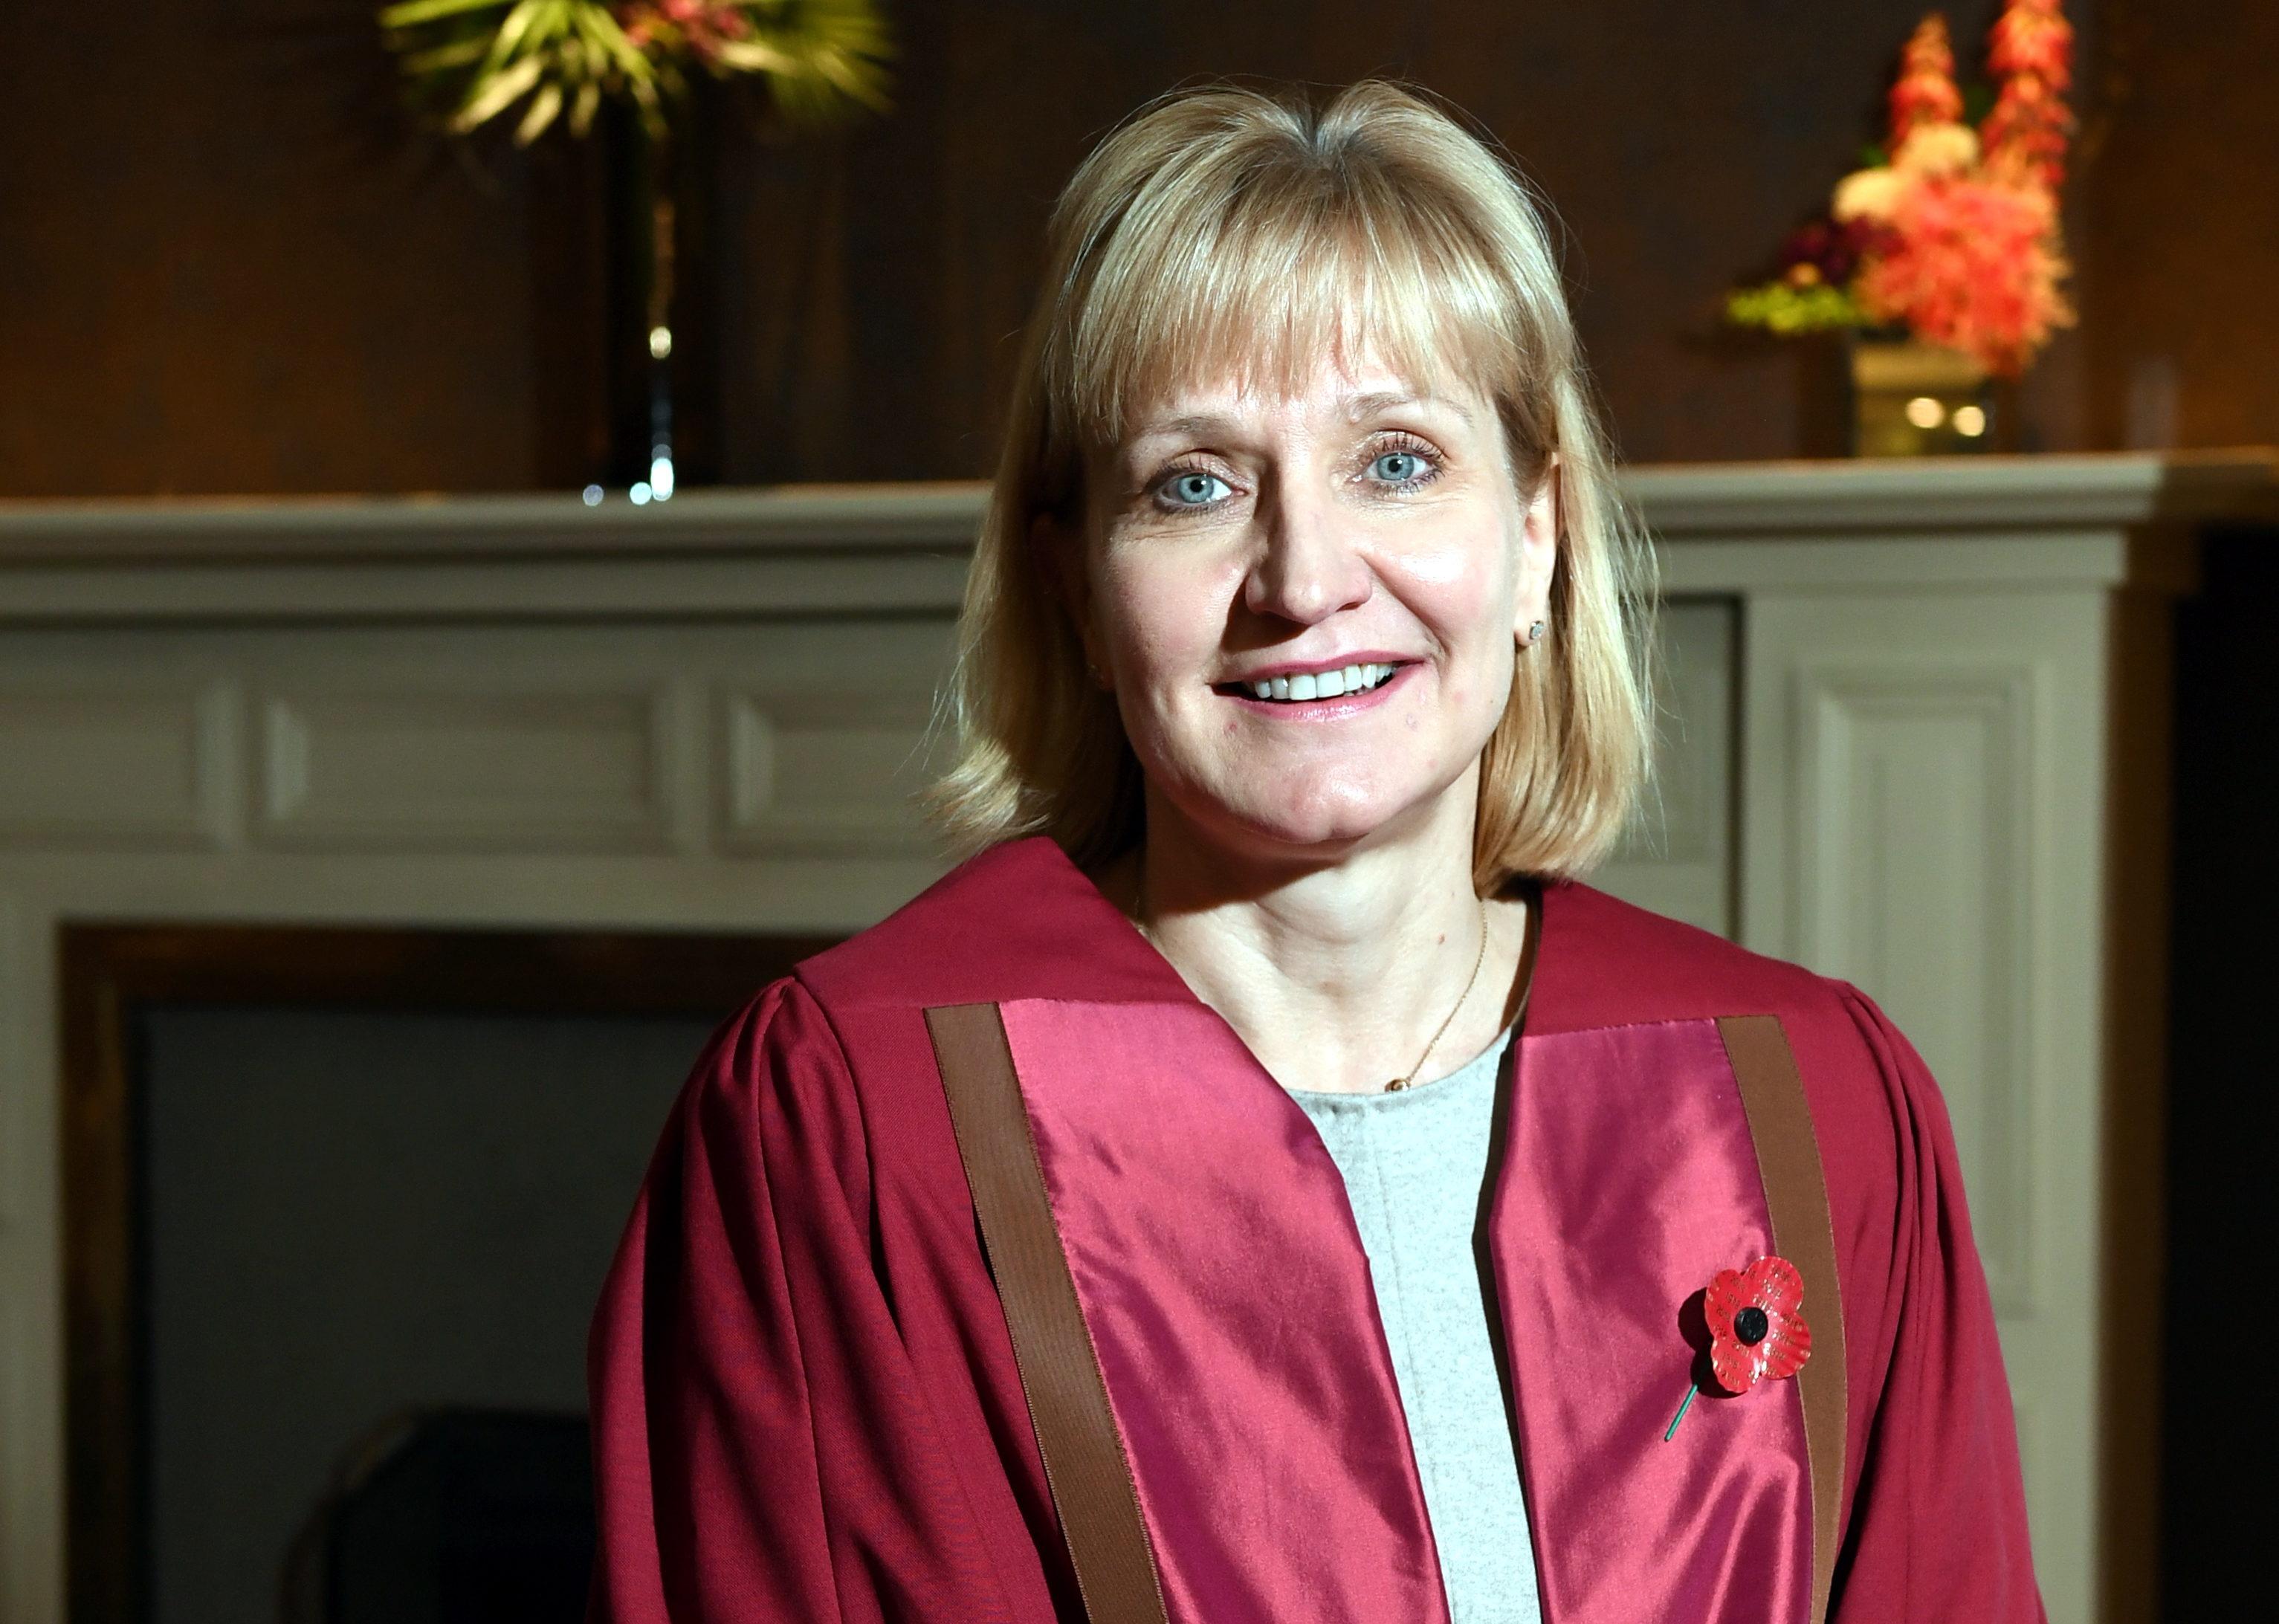 Deirdre Michie OBE has received the Nescol Fellowship award